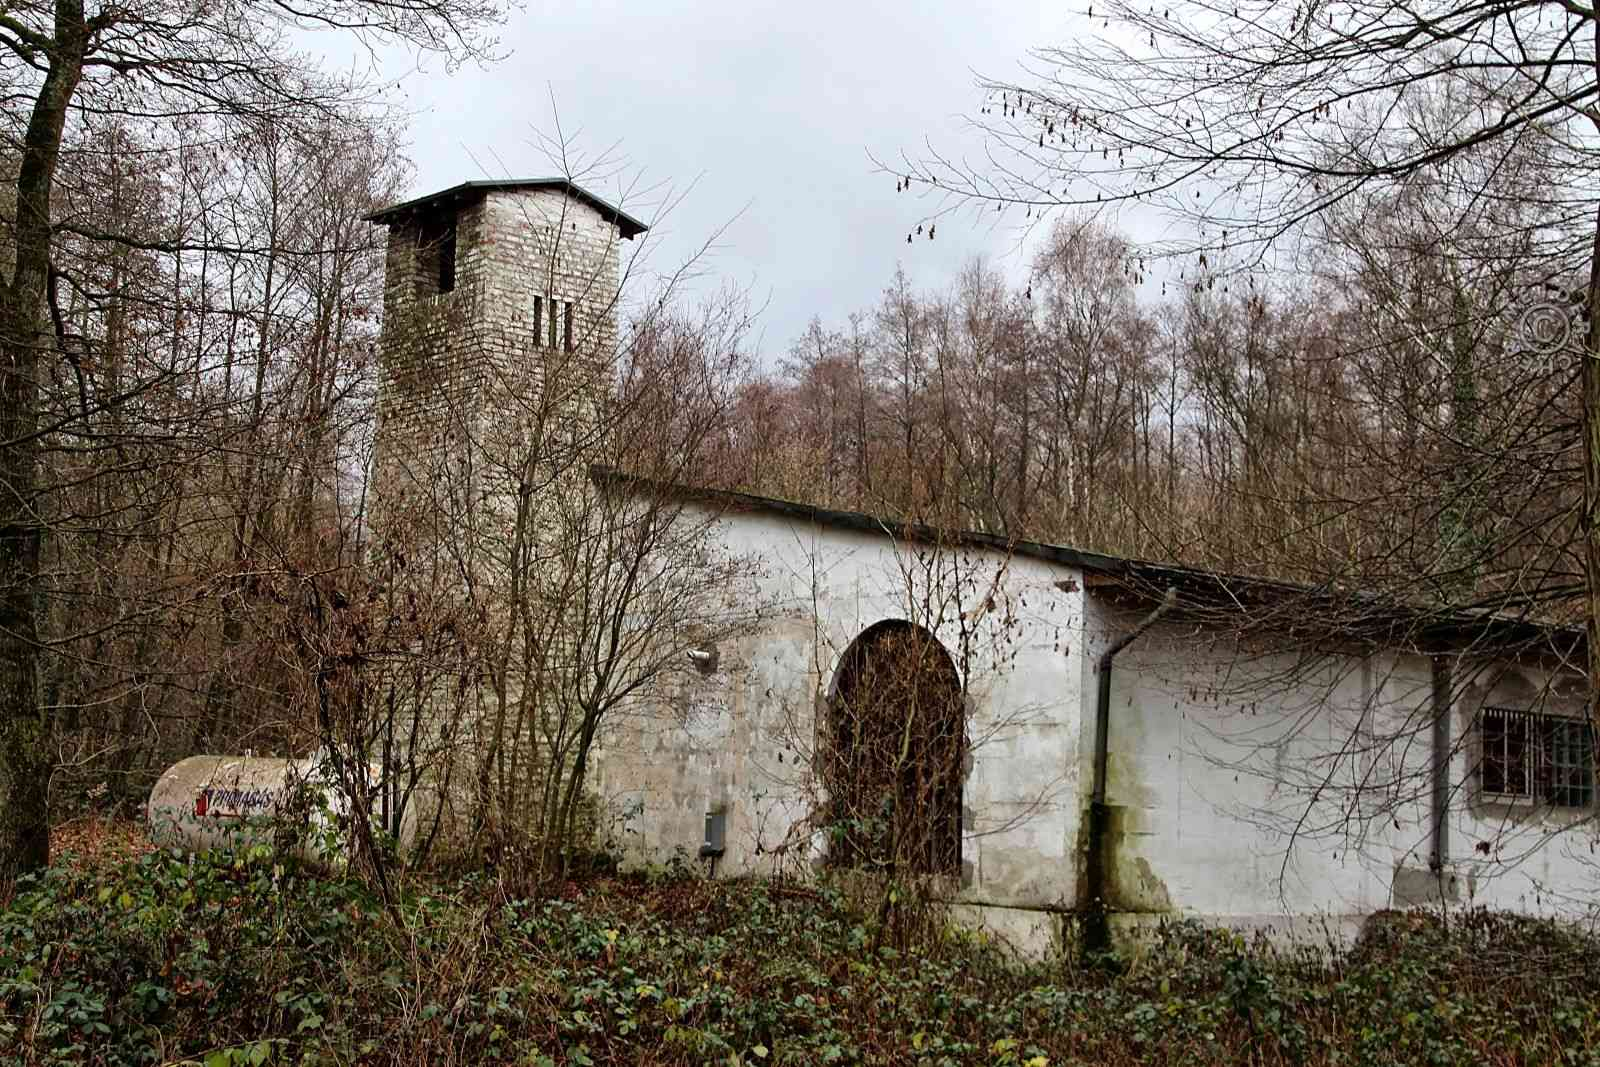 Lintorfer Erzbergwerke 513